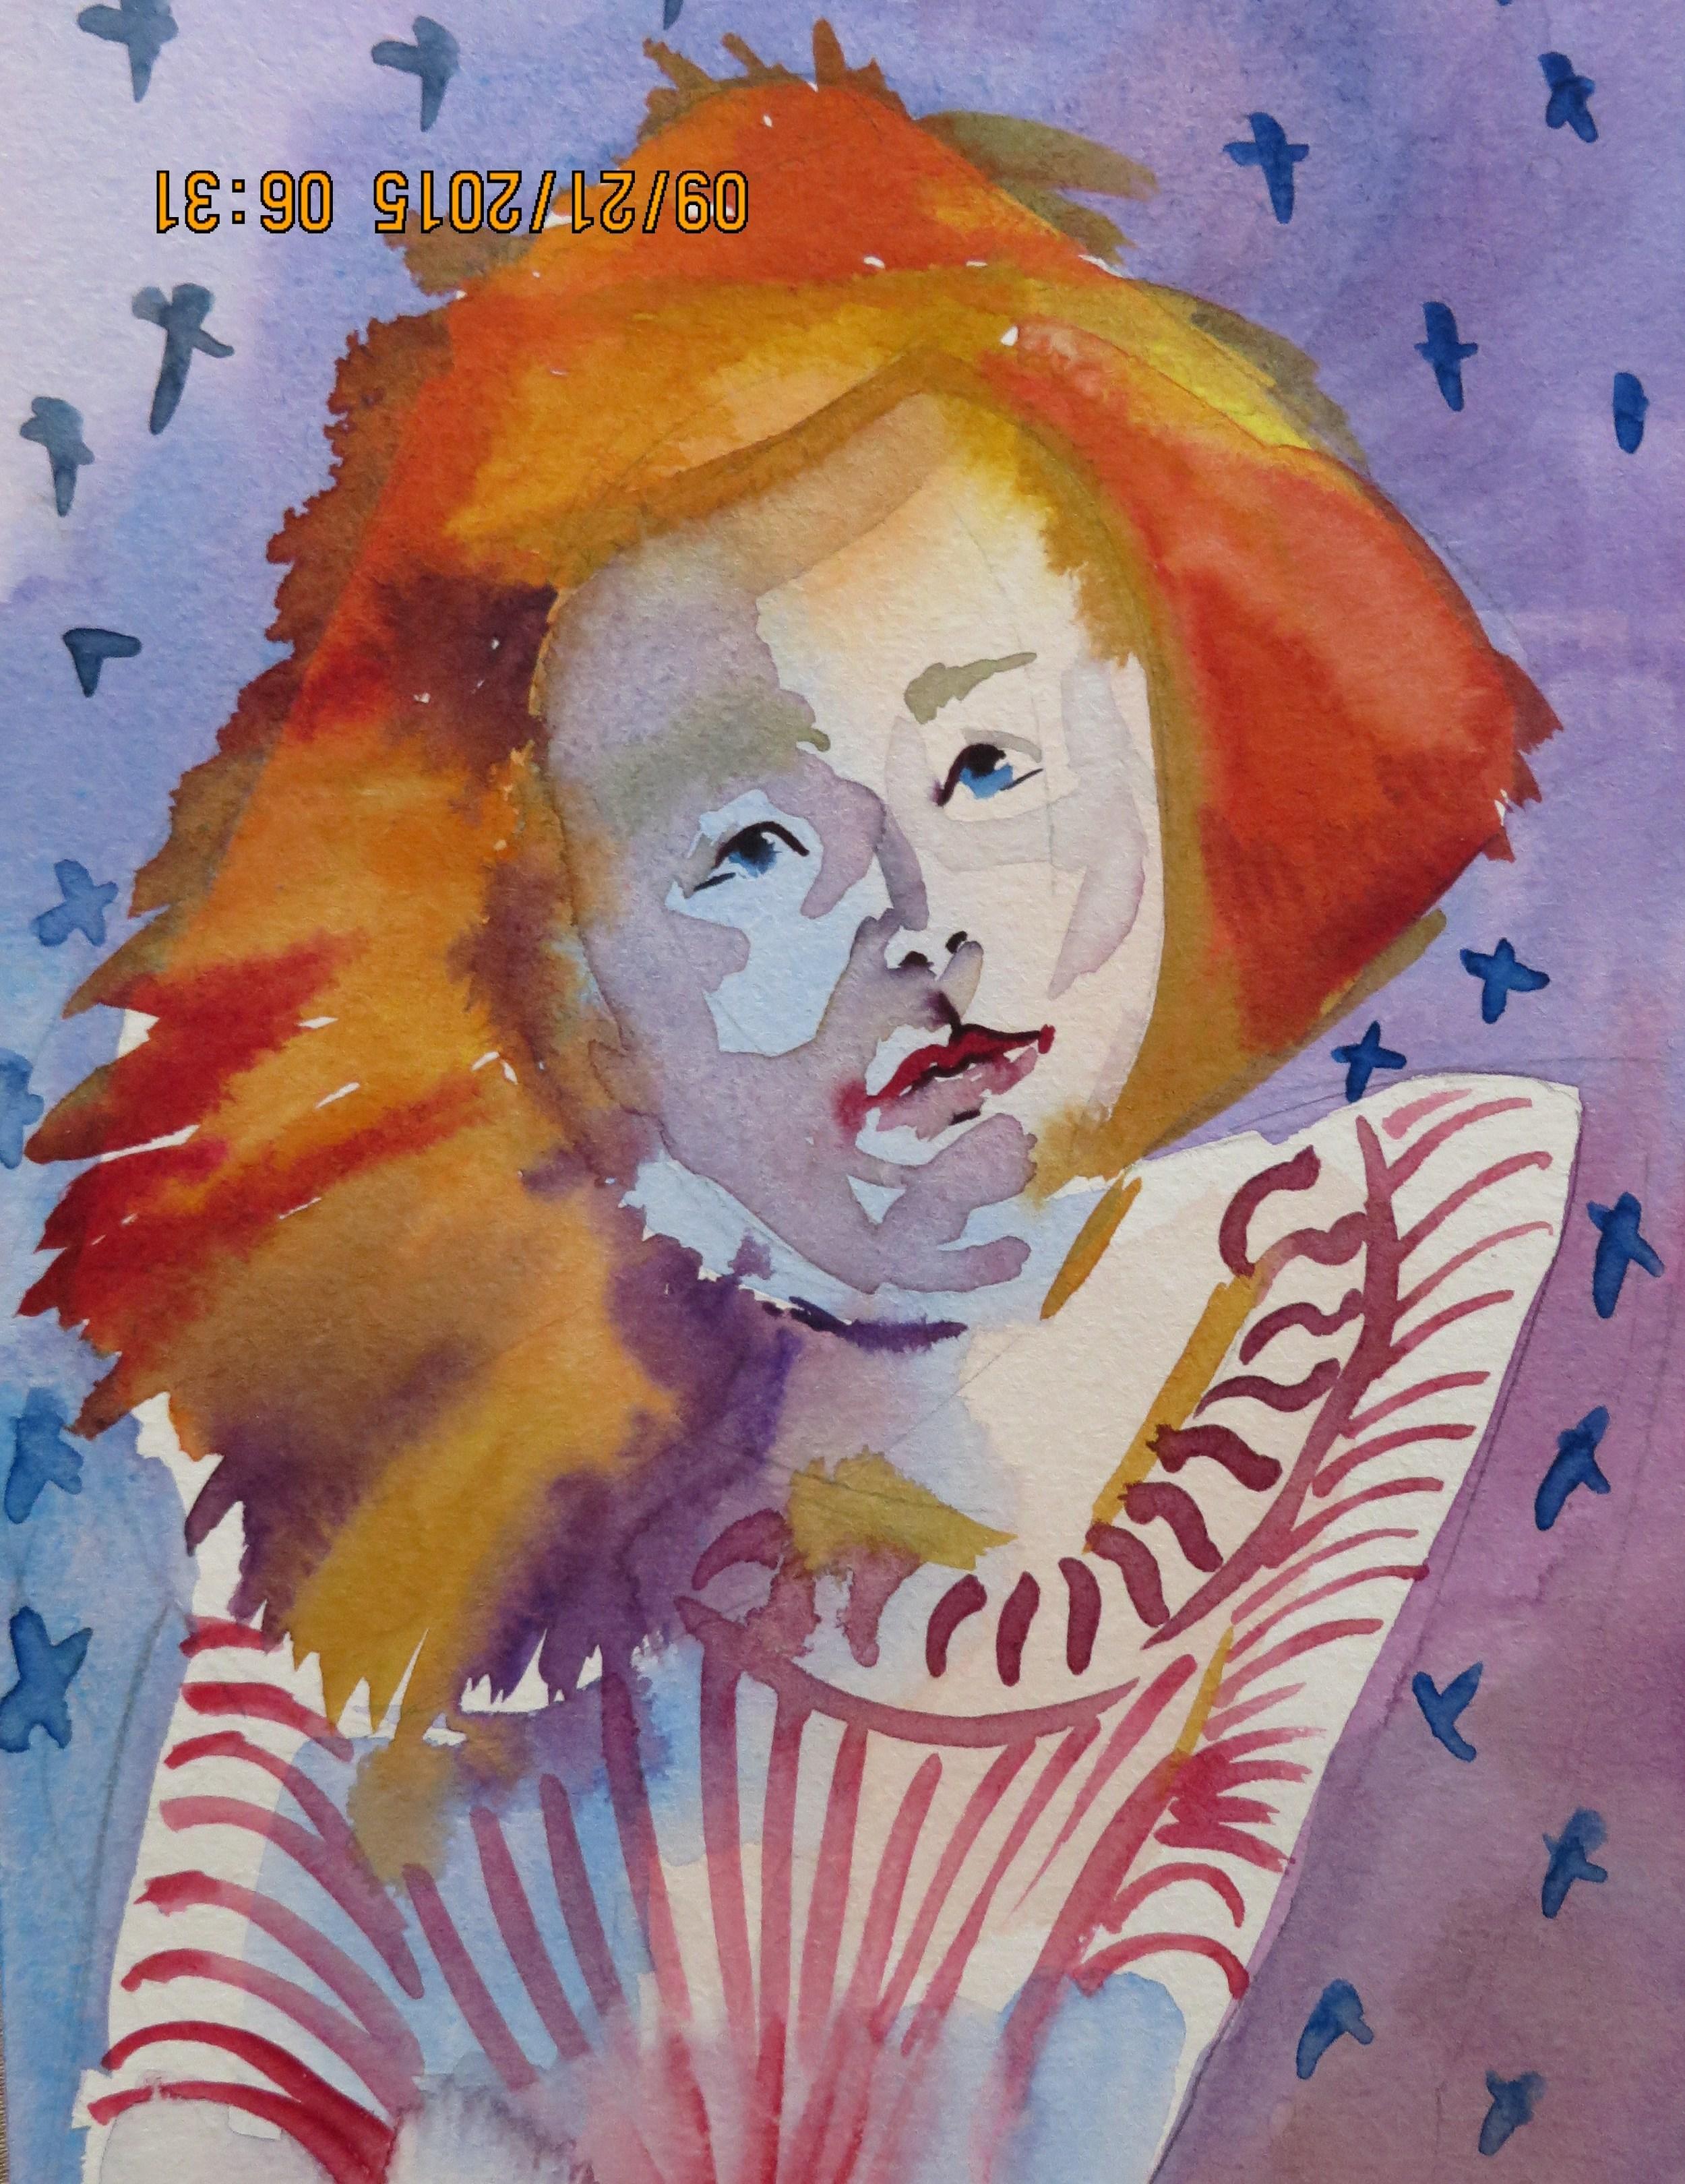 PIX OF ARTWORK 080.JPG